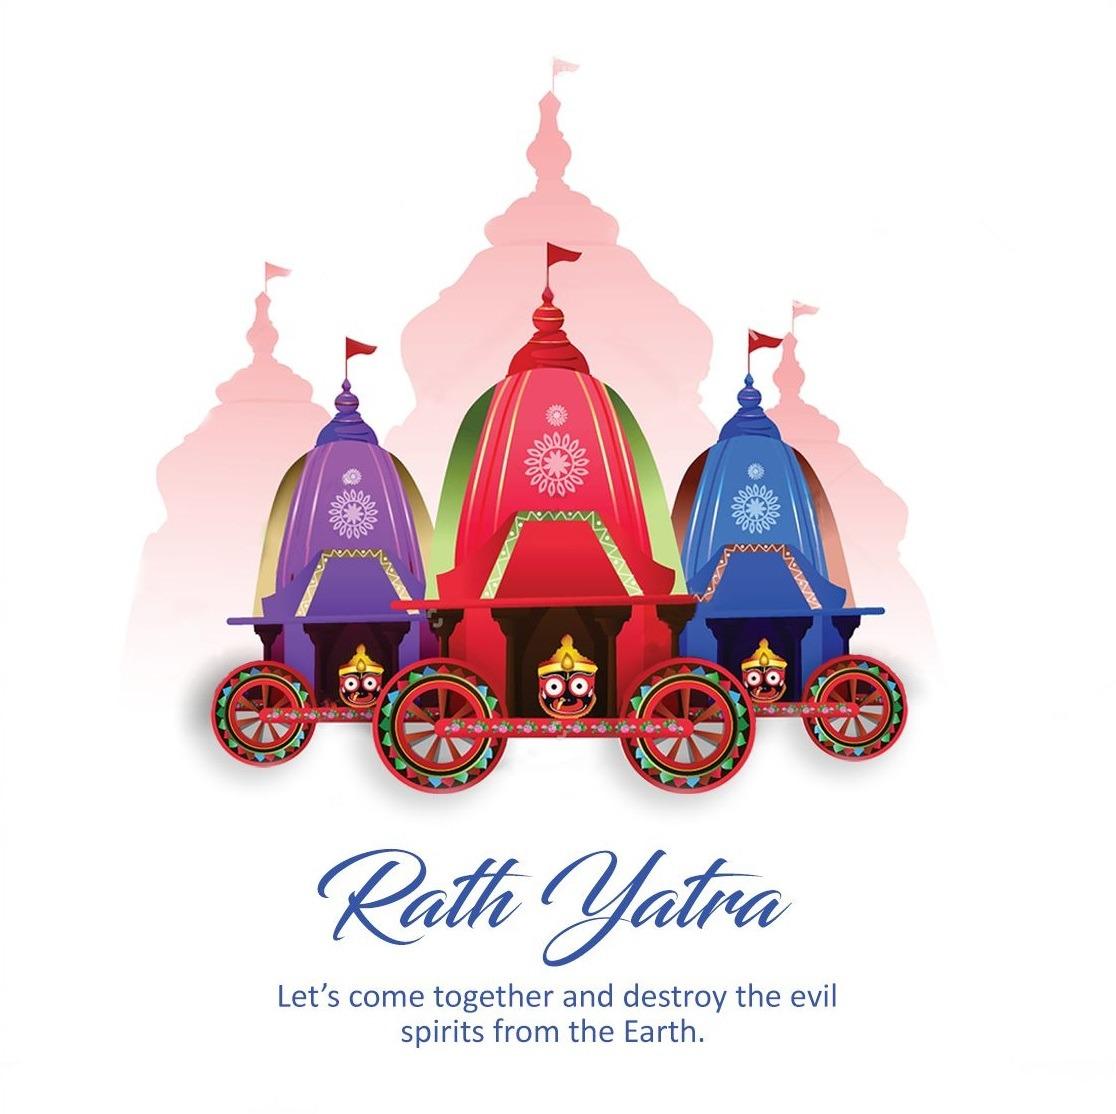 Rath Yatra 2021 wallpaper